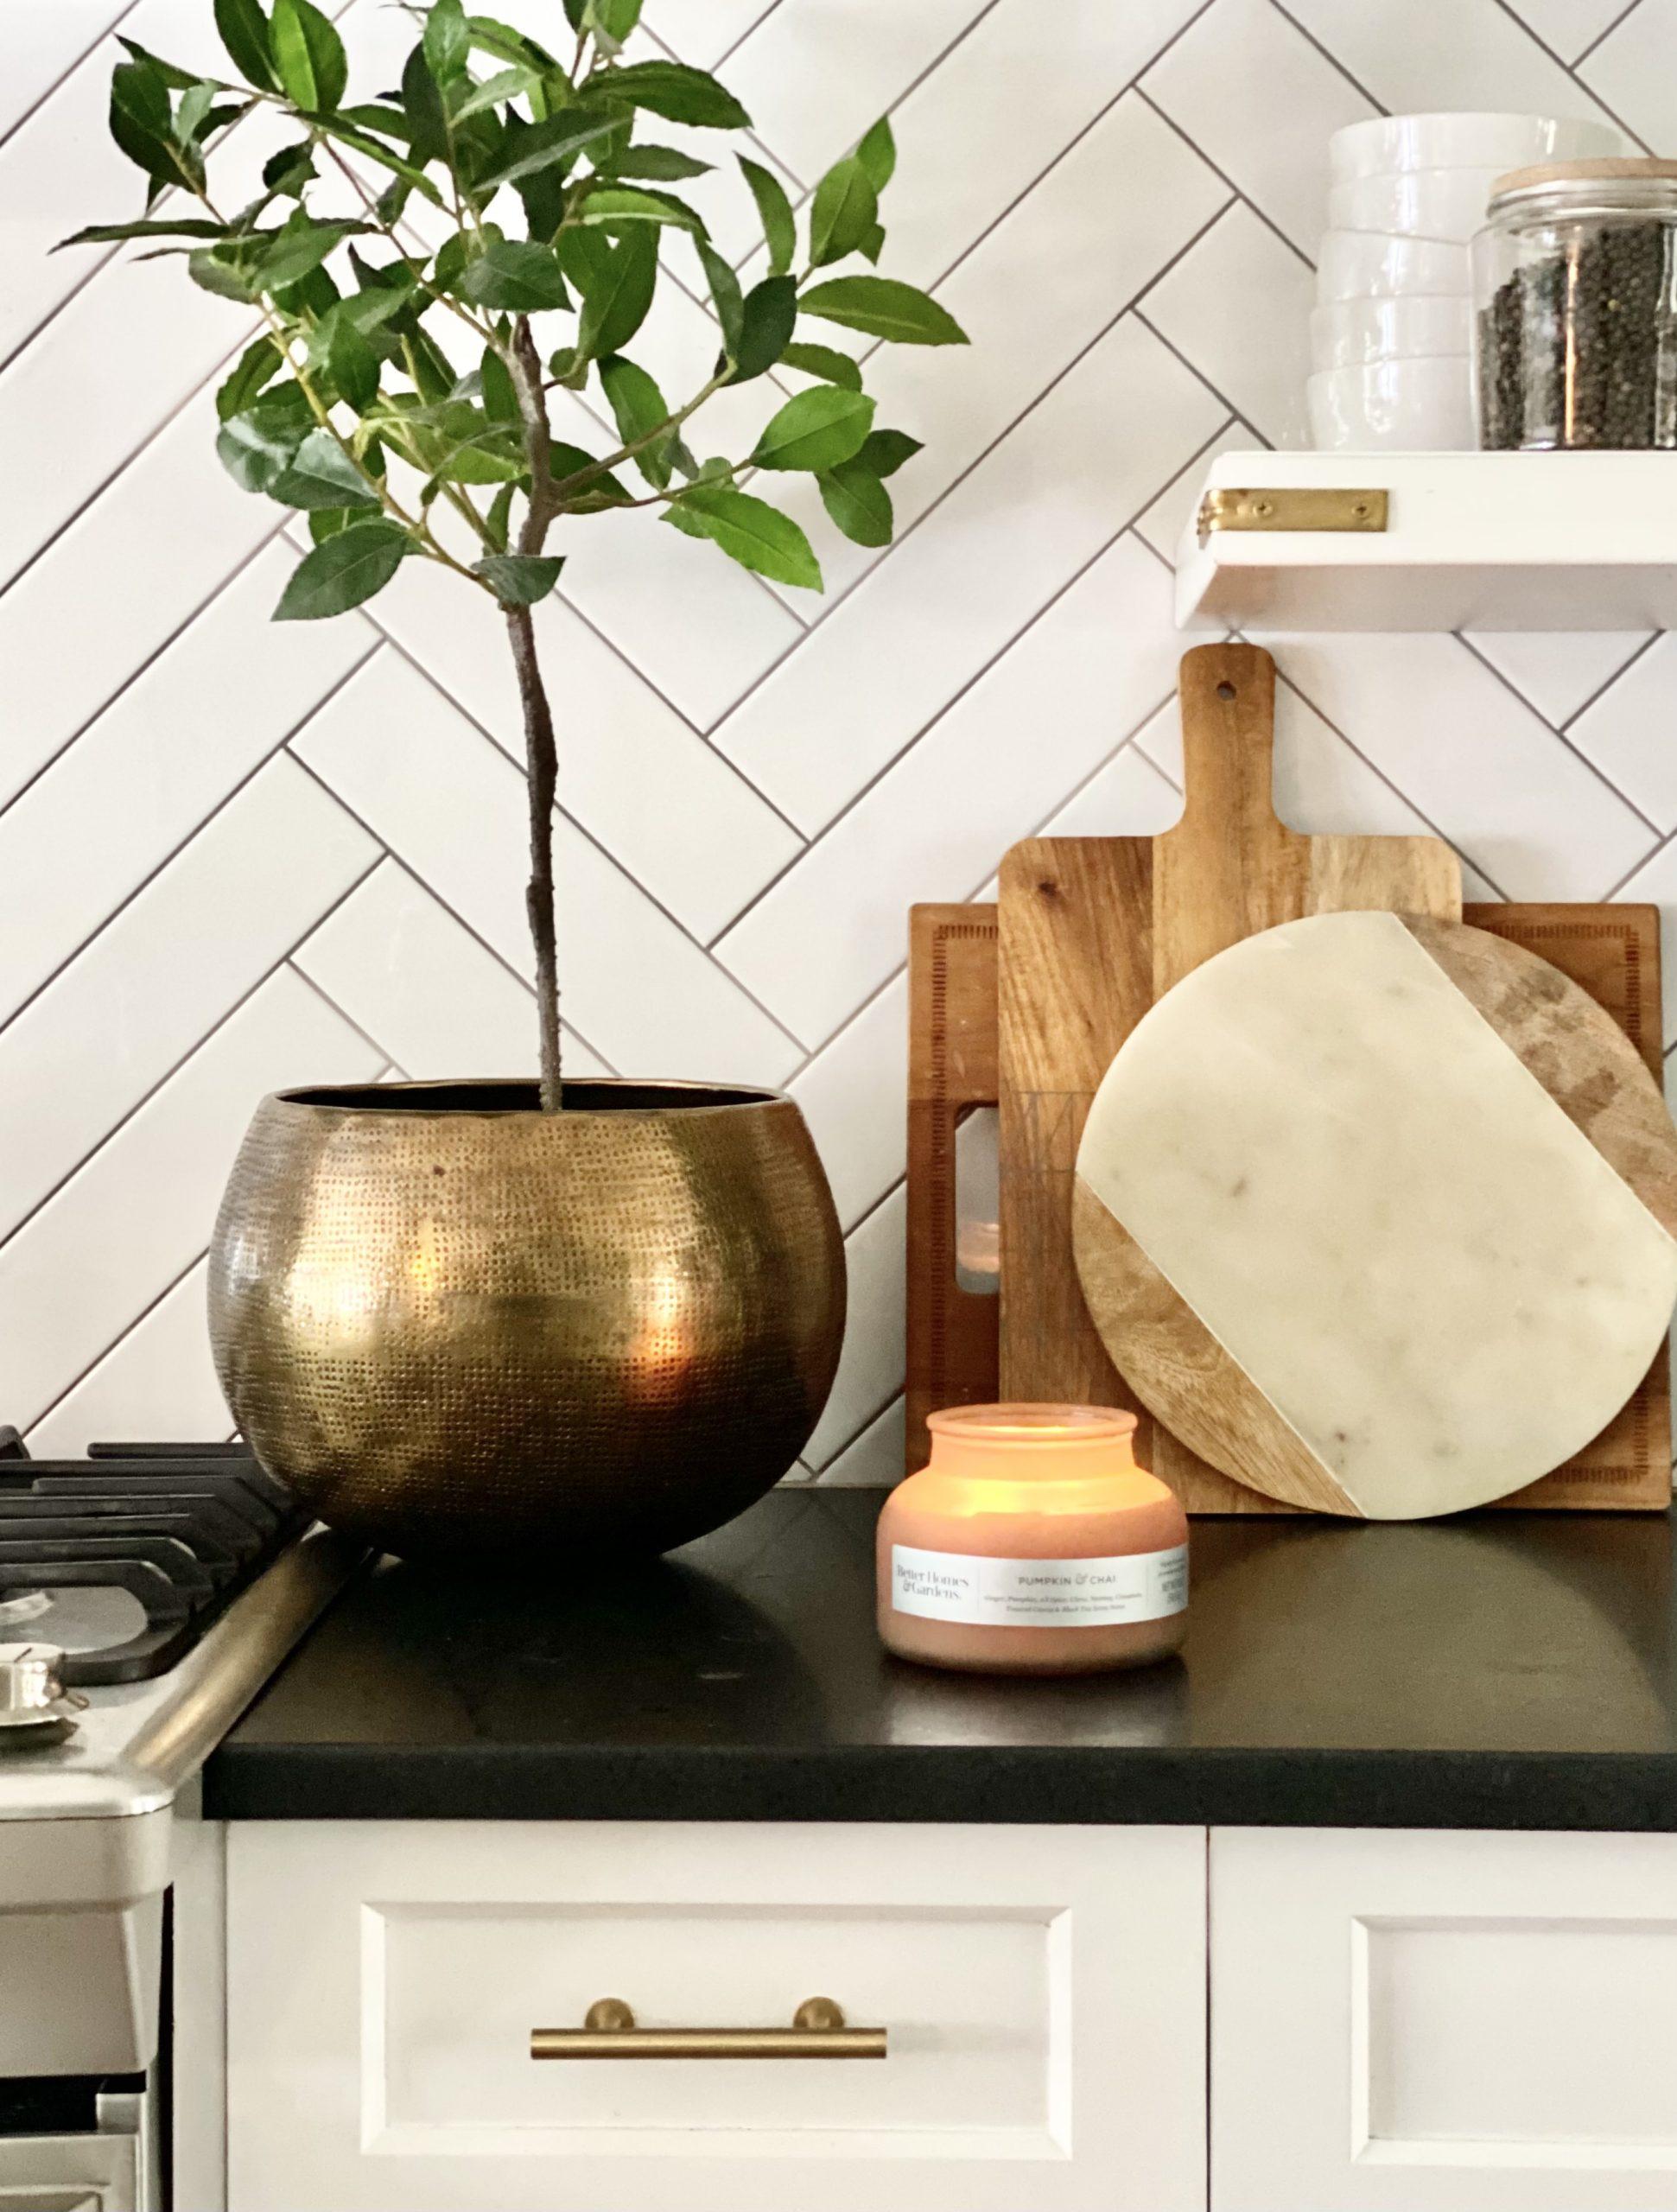 cozy-kitchen-countertop-decor-topiary